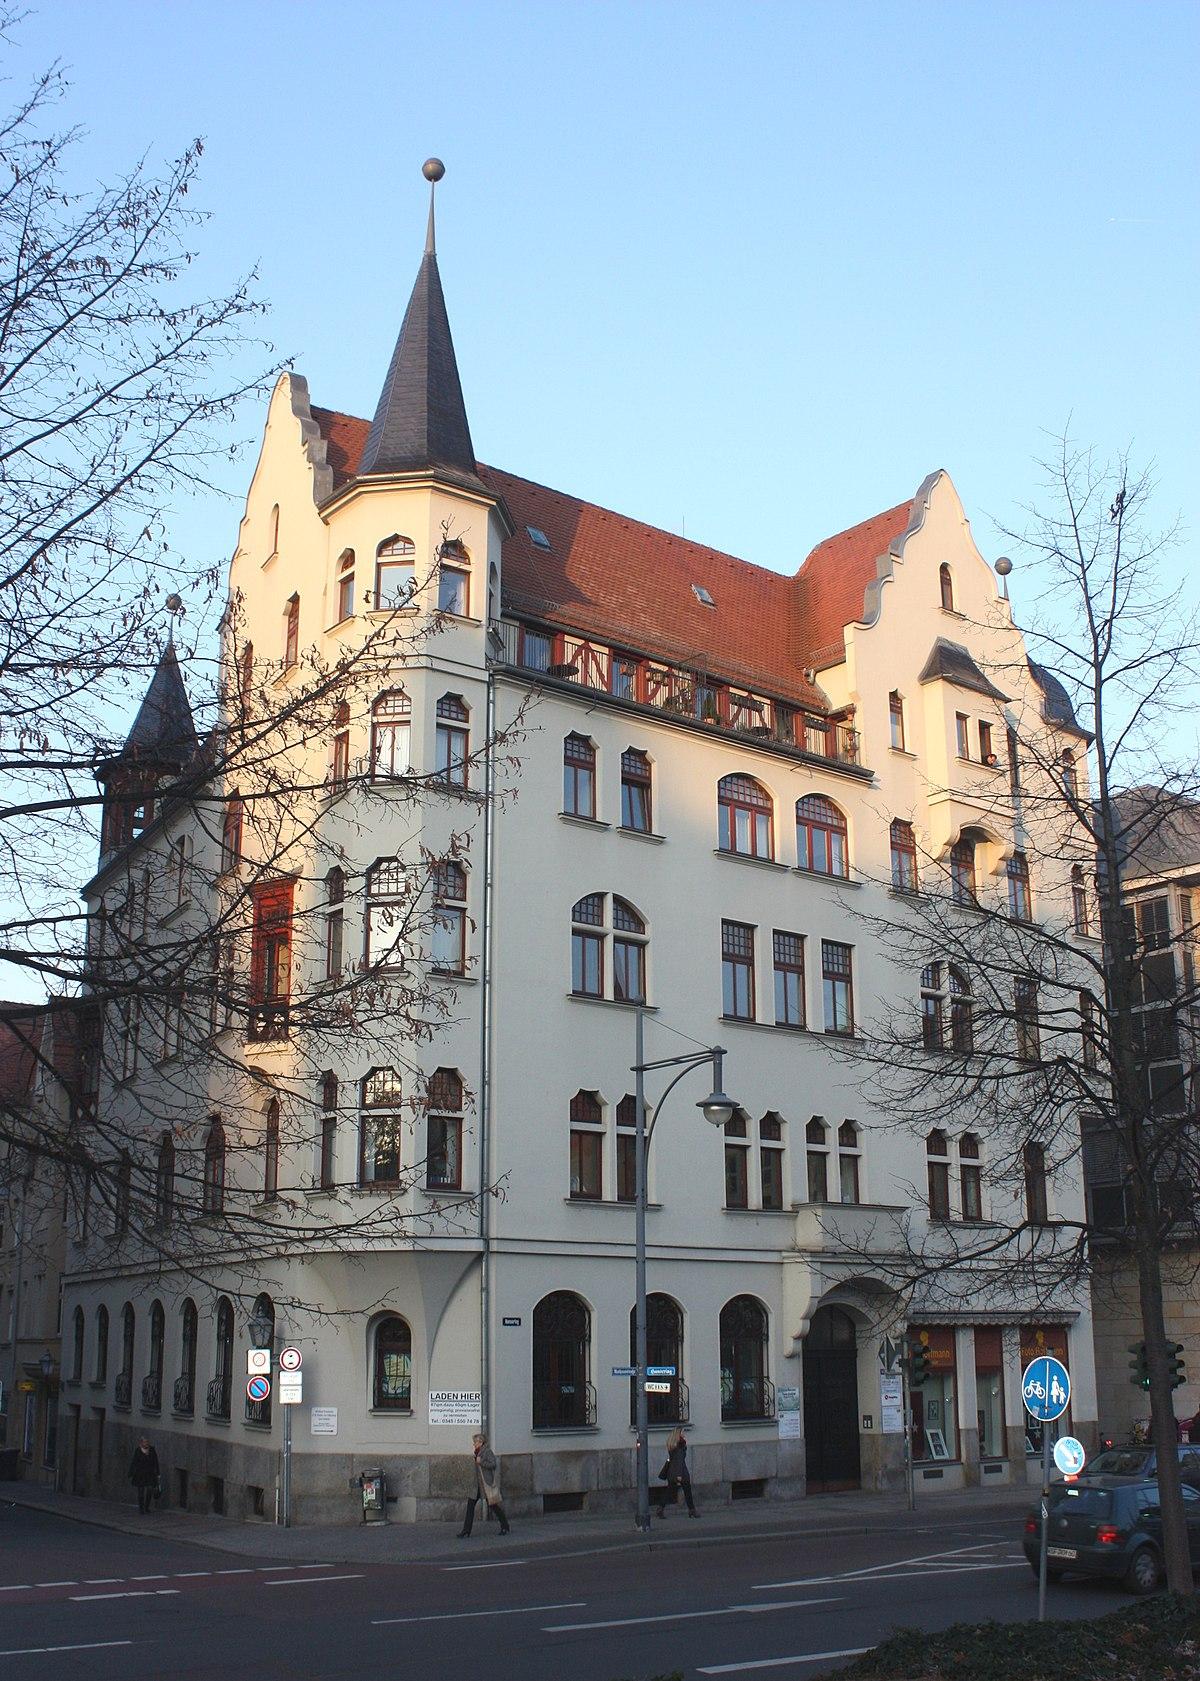 Haus Mieten Halle Saale : file halle saale haus hansering 14 jpg wikimedia commons ~ Watch28wear.com Haus und Dekorationen